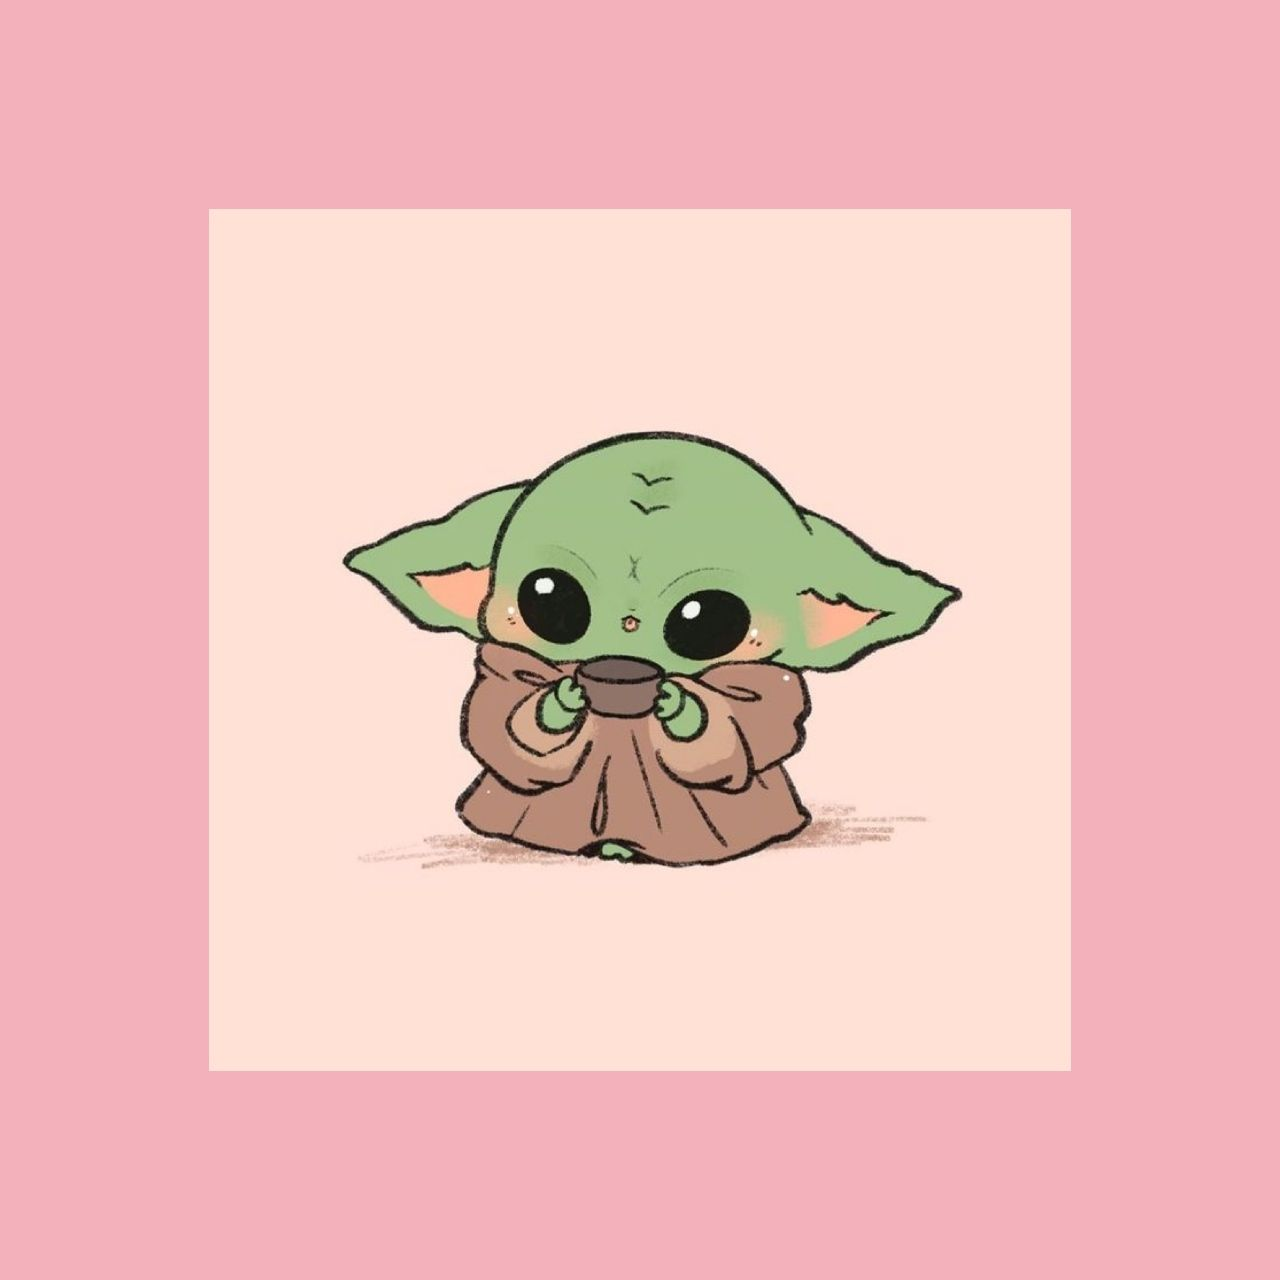 Pink Baby Yoda Yoda Wallpaper Yoda Drawing Cute Cartoon Wallpapers